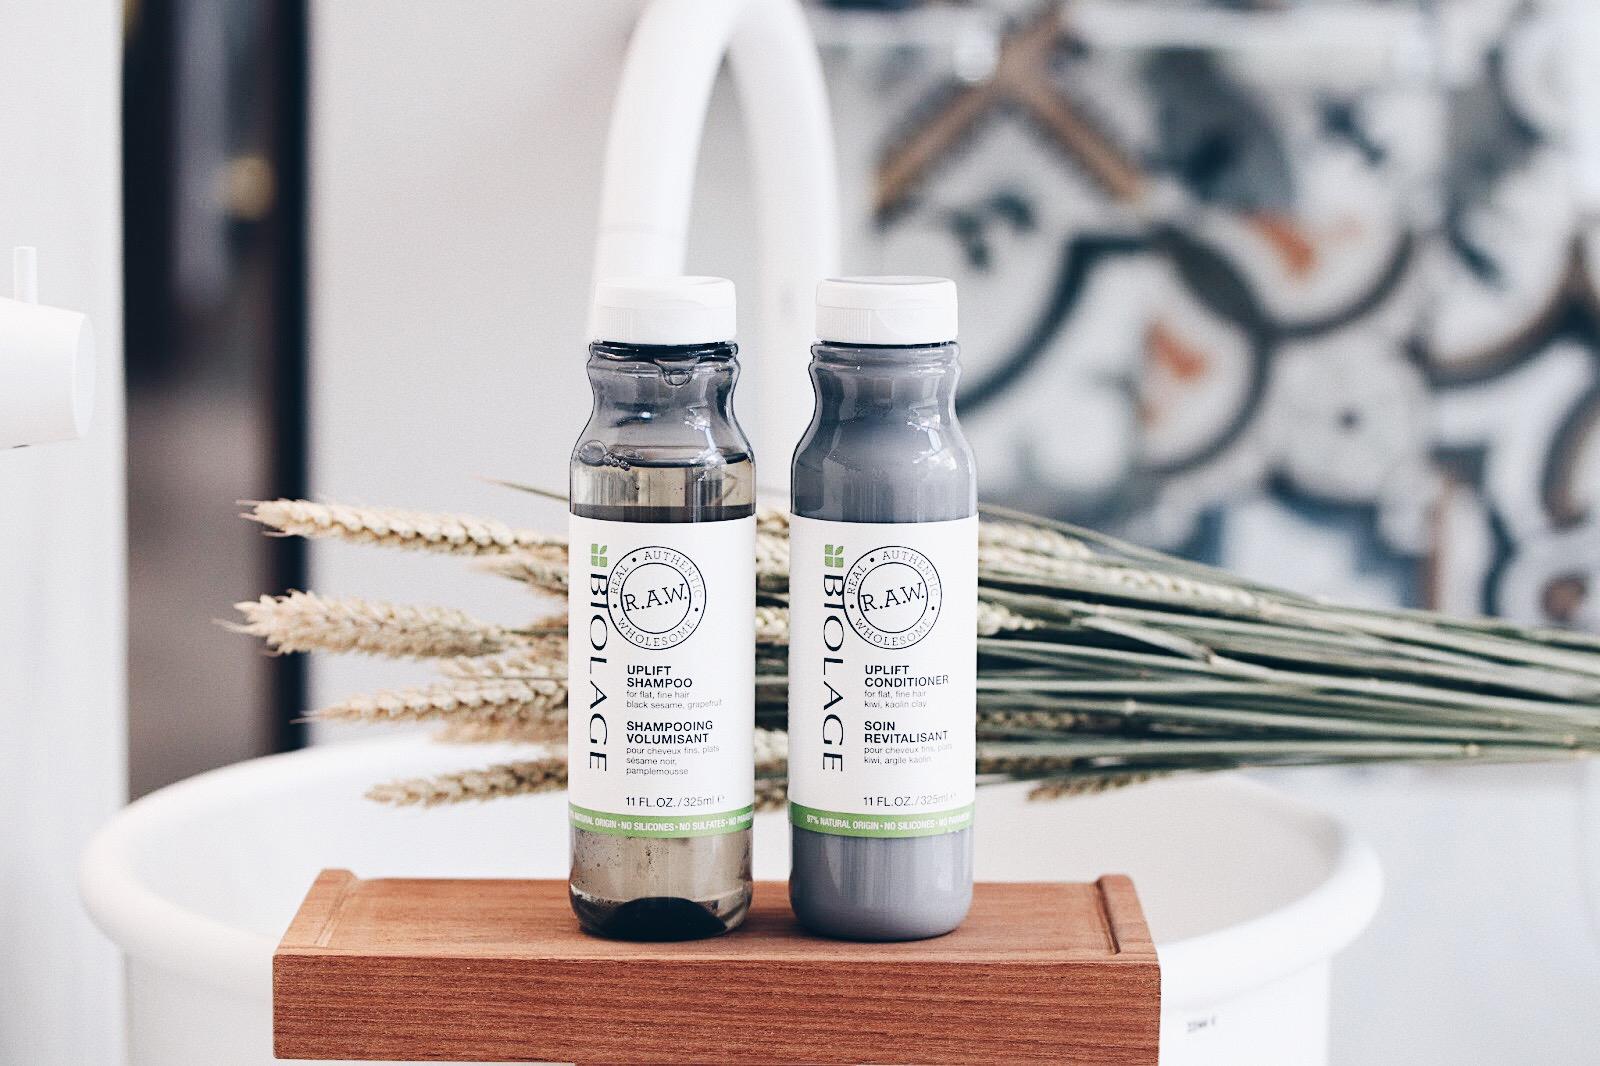 biolage raw uplift shampooing apres volume avis test